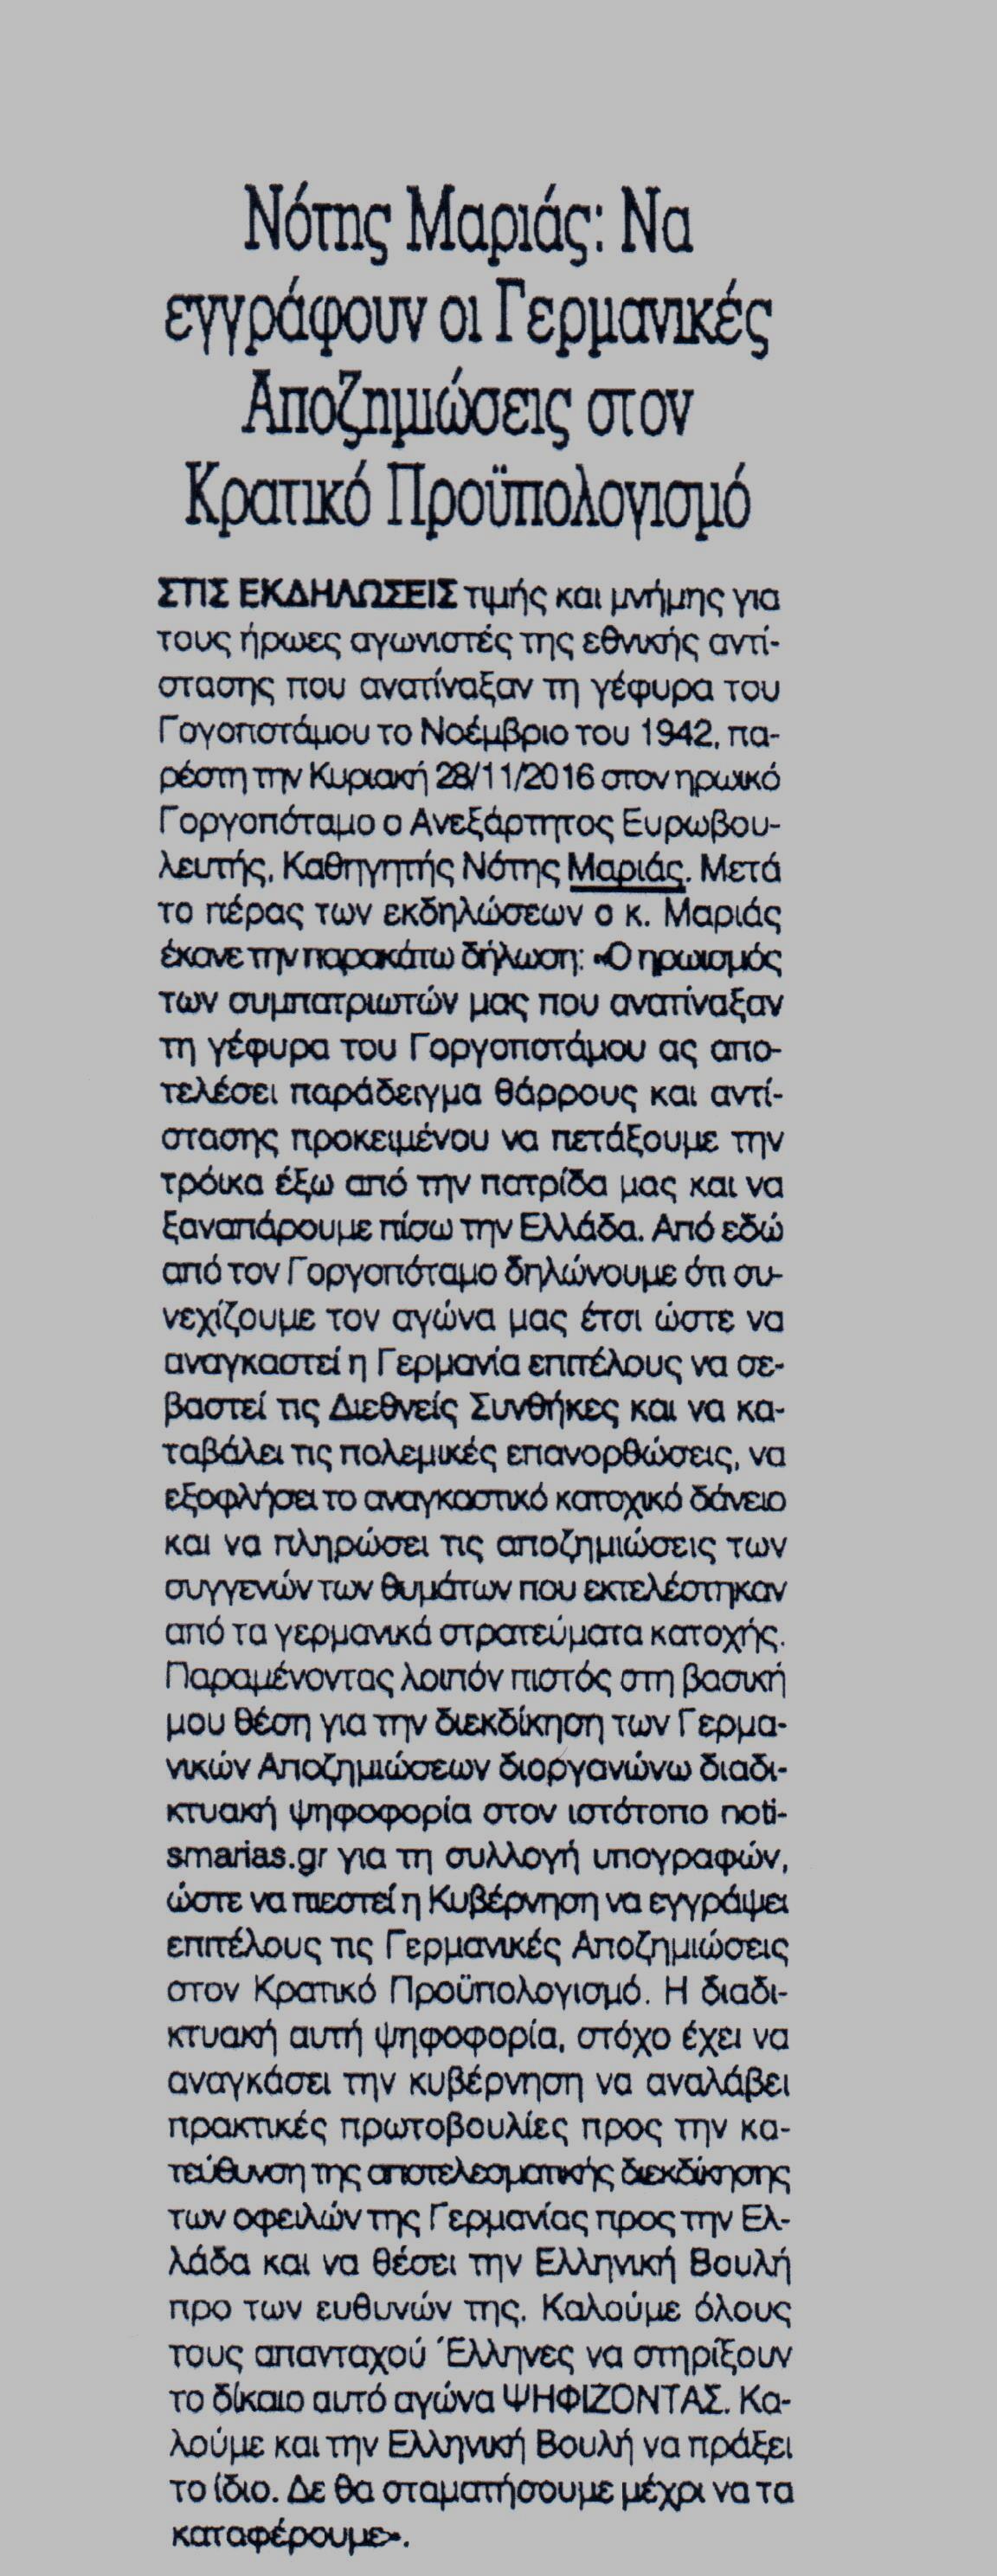 kontra-news-30-11-2016